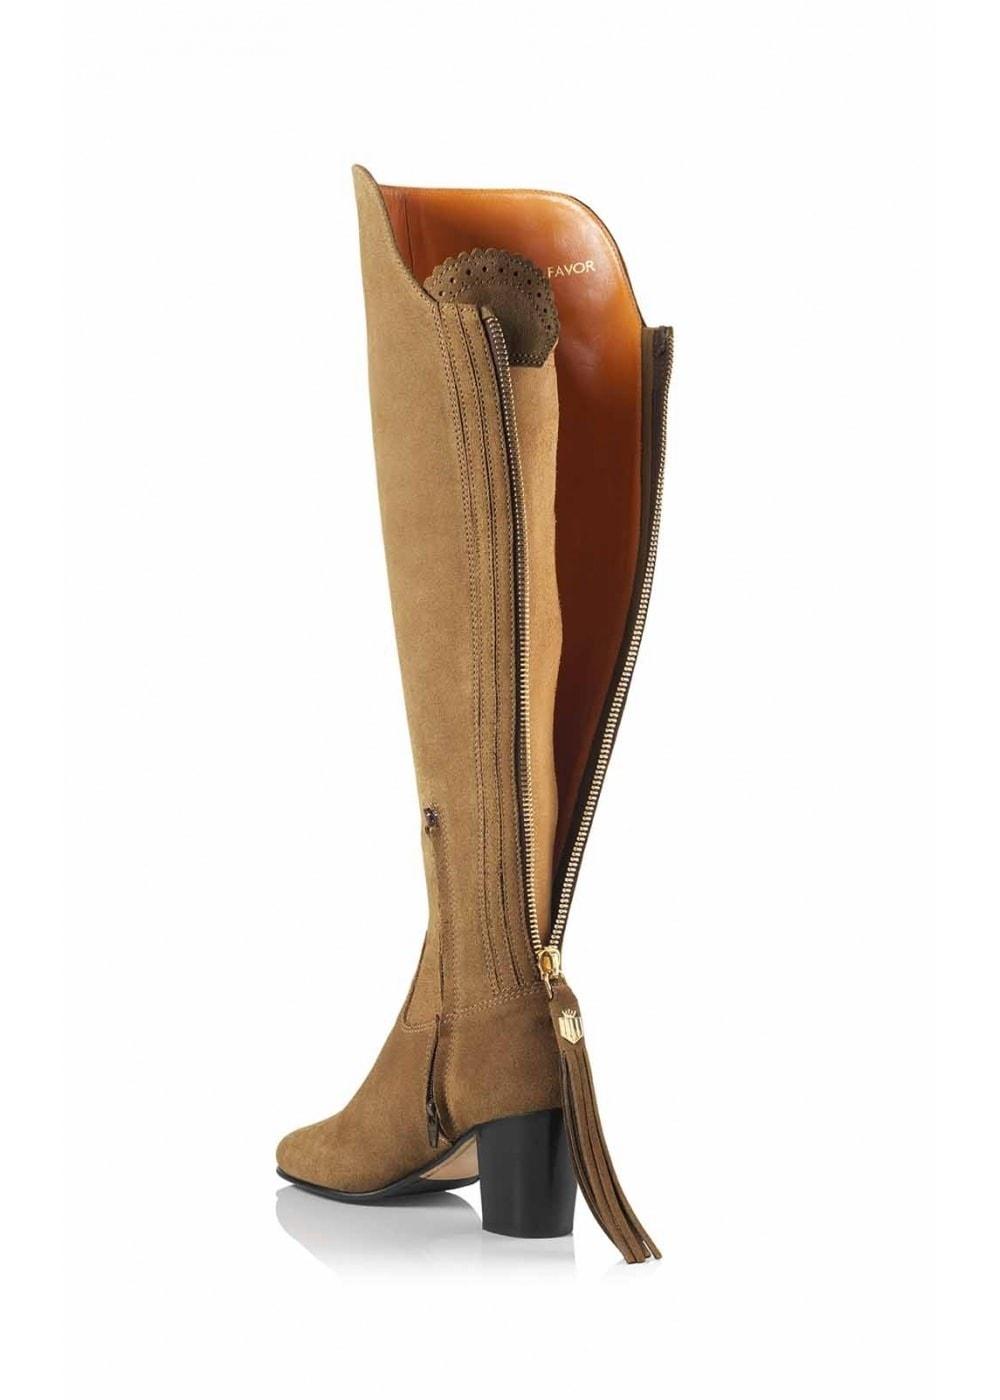 chrysalis over the knee boot